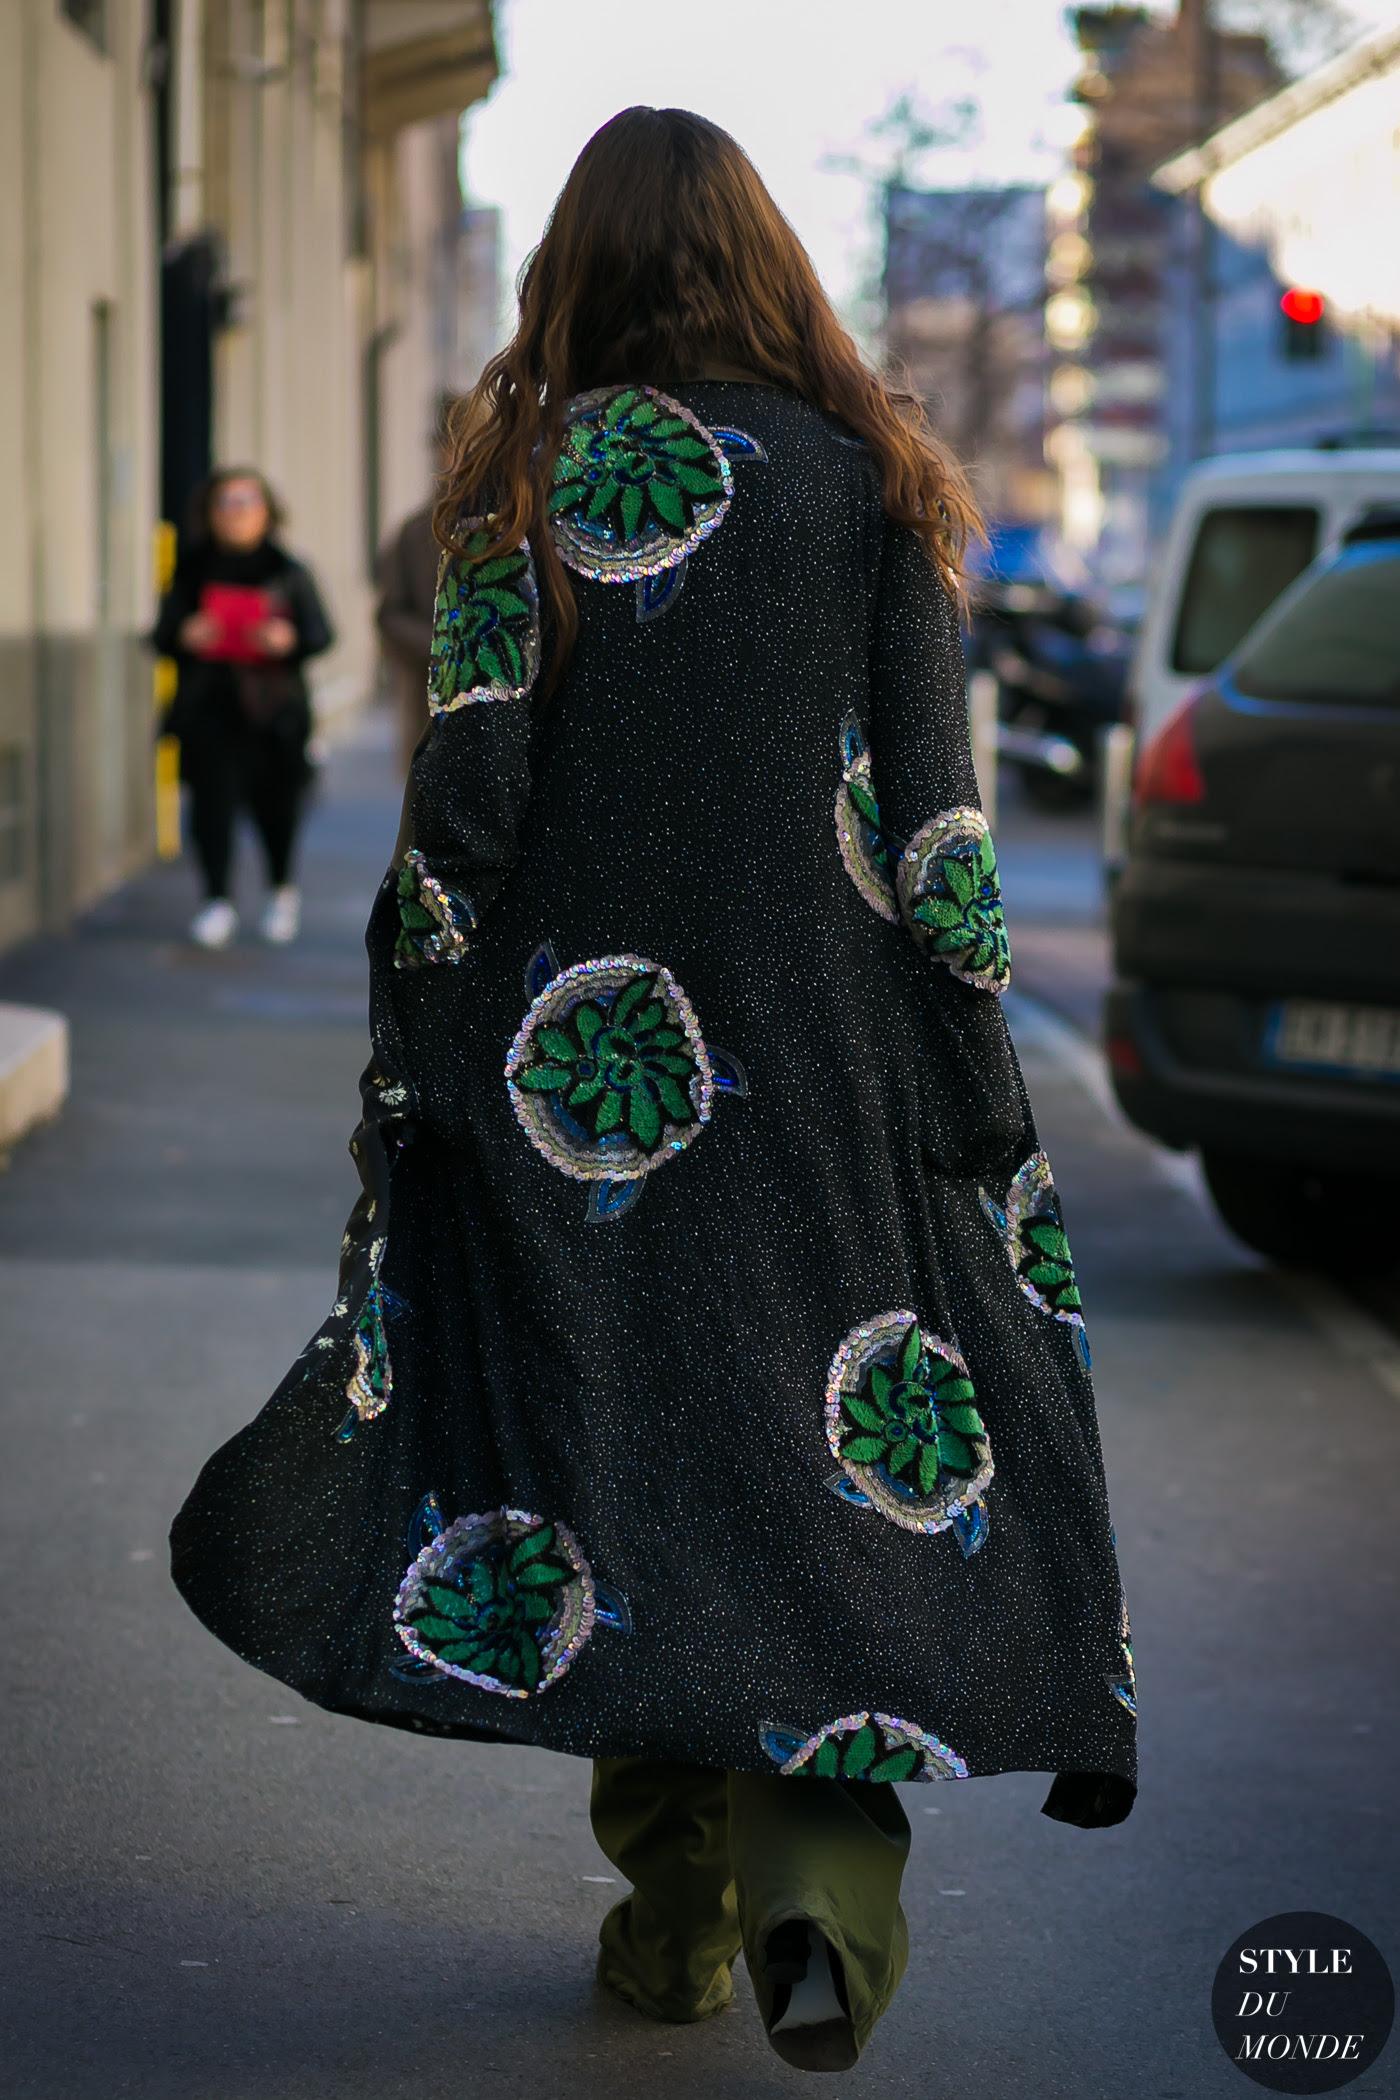 http://www.styledumonde.com/wp-content/uploads/2017/01/Erika-Boldrin-by-STYLEDUMONDE-Street-Style-Fashion-Photography0E2A4925-700x1050@2x.jpg